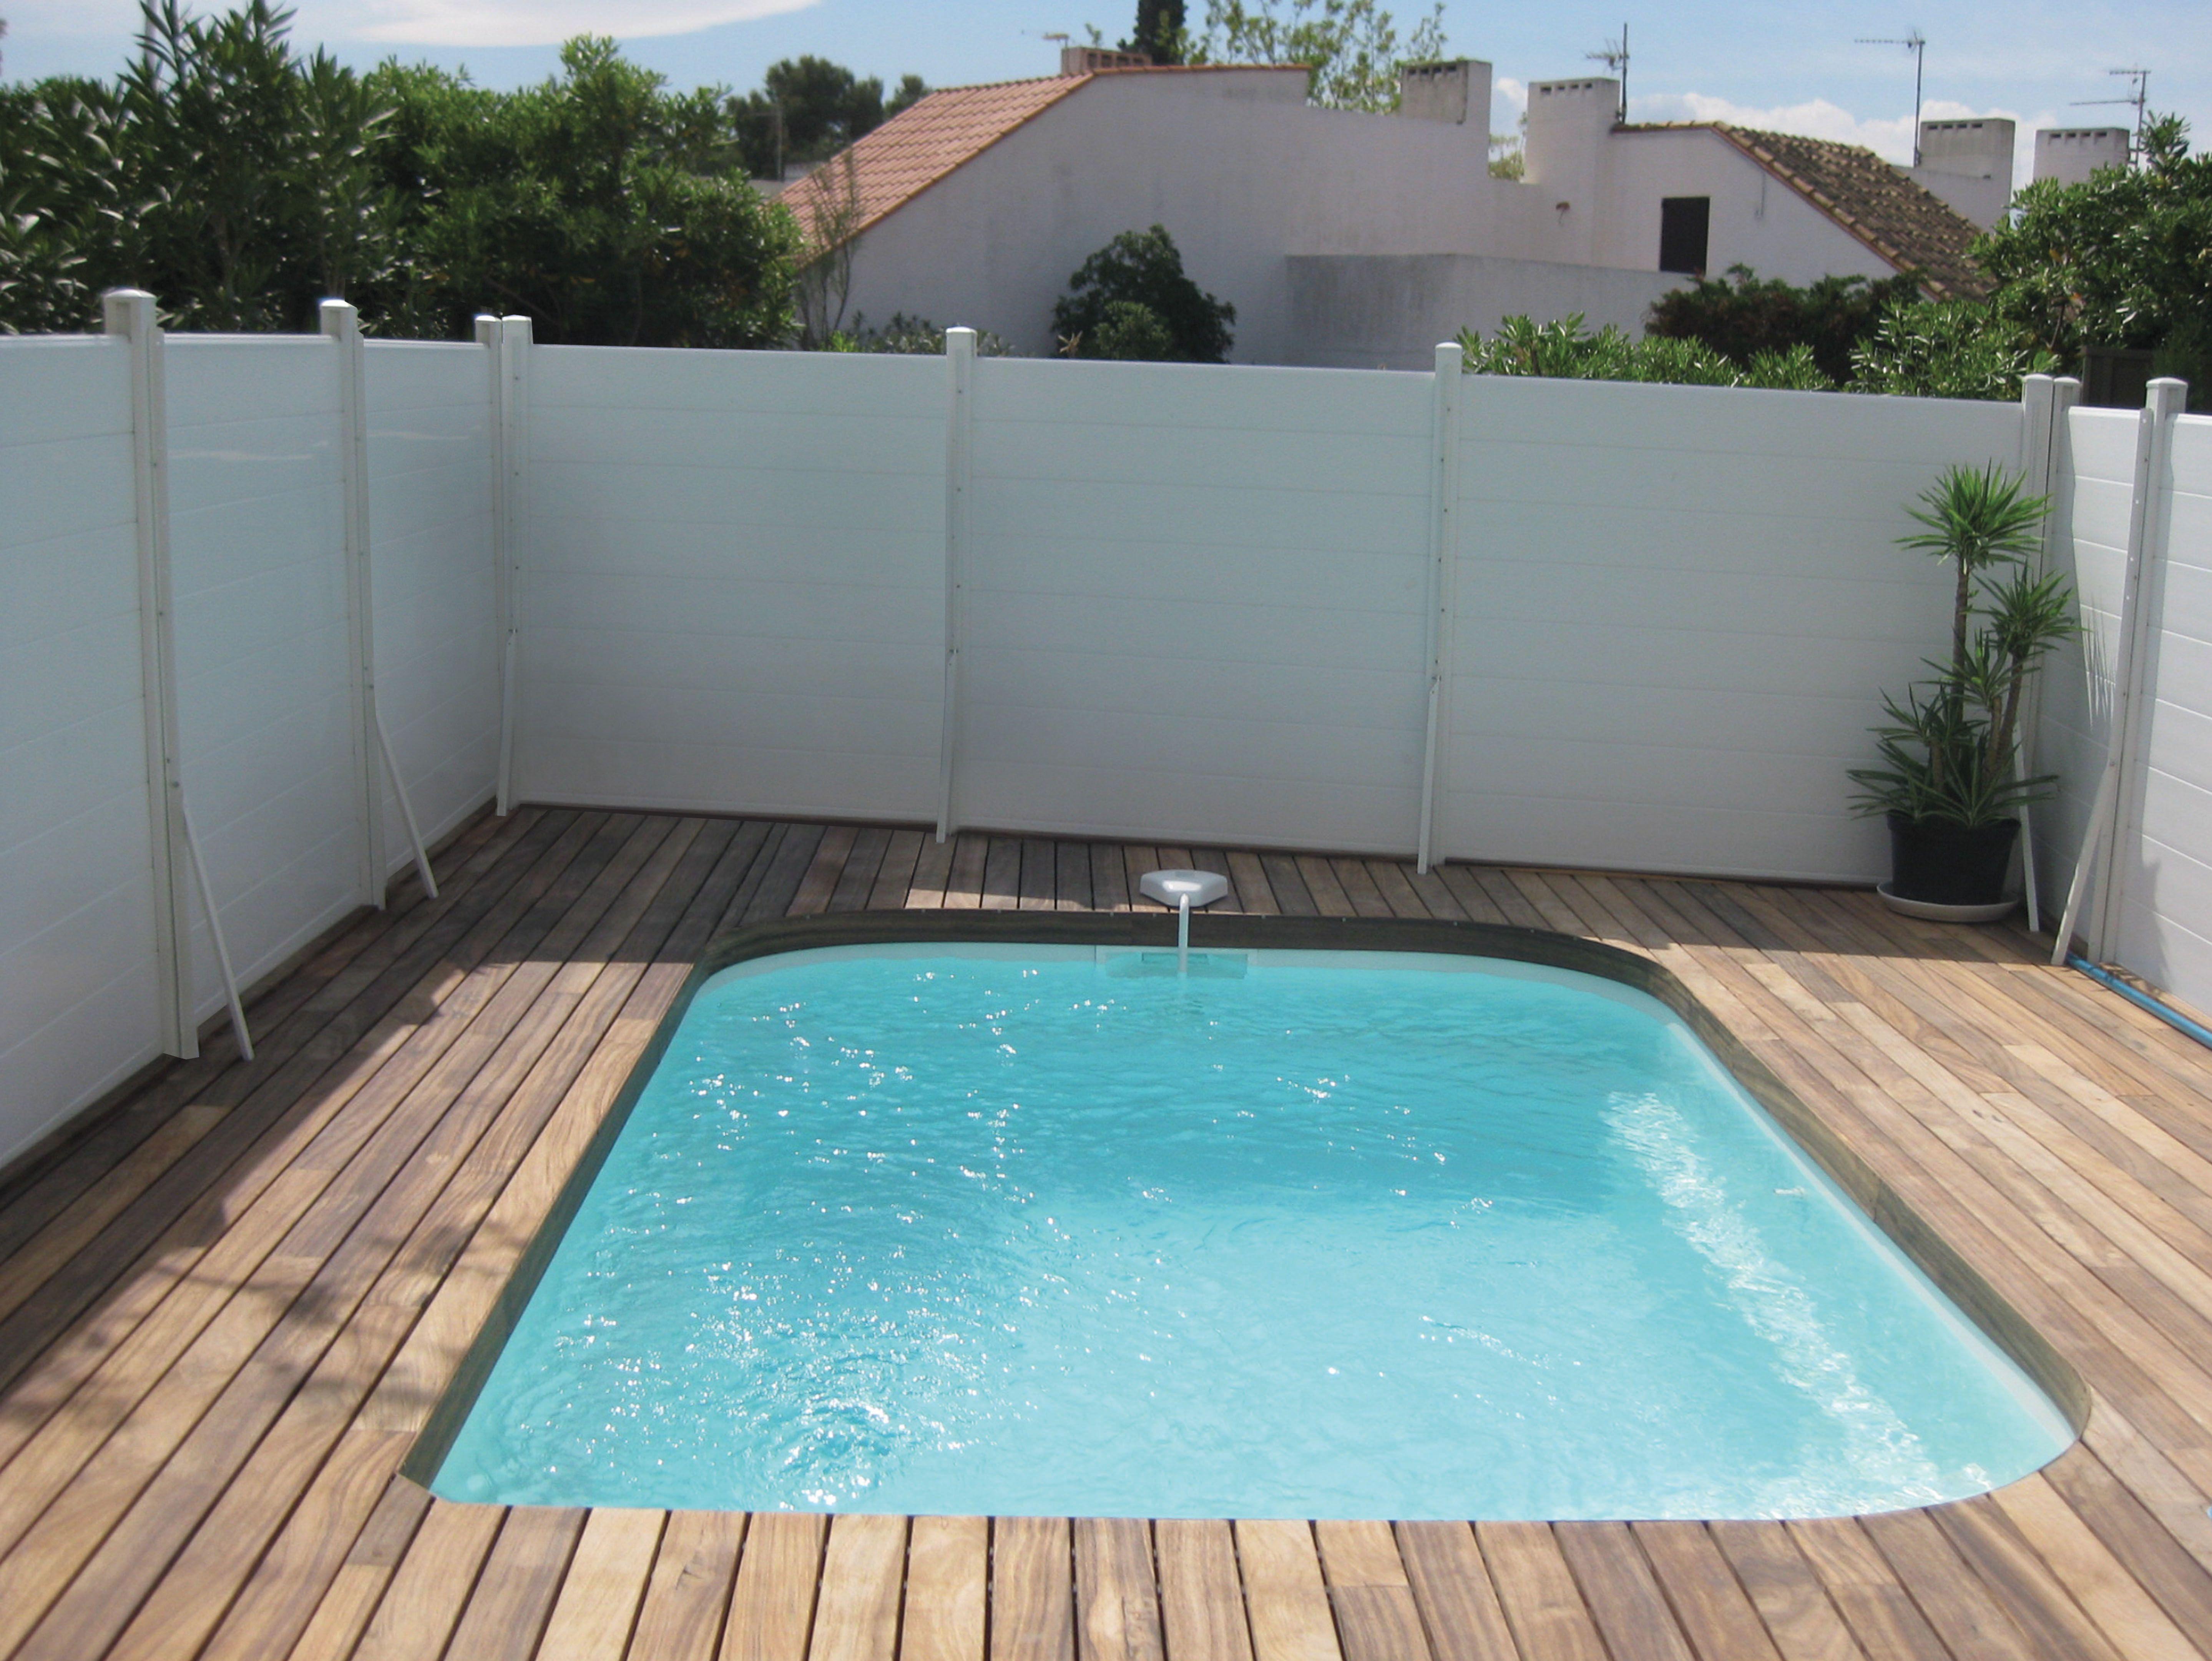 coque piscine 4 x 2